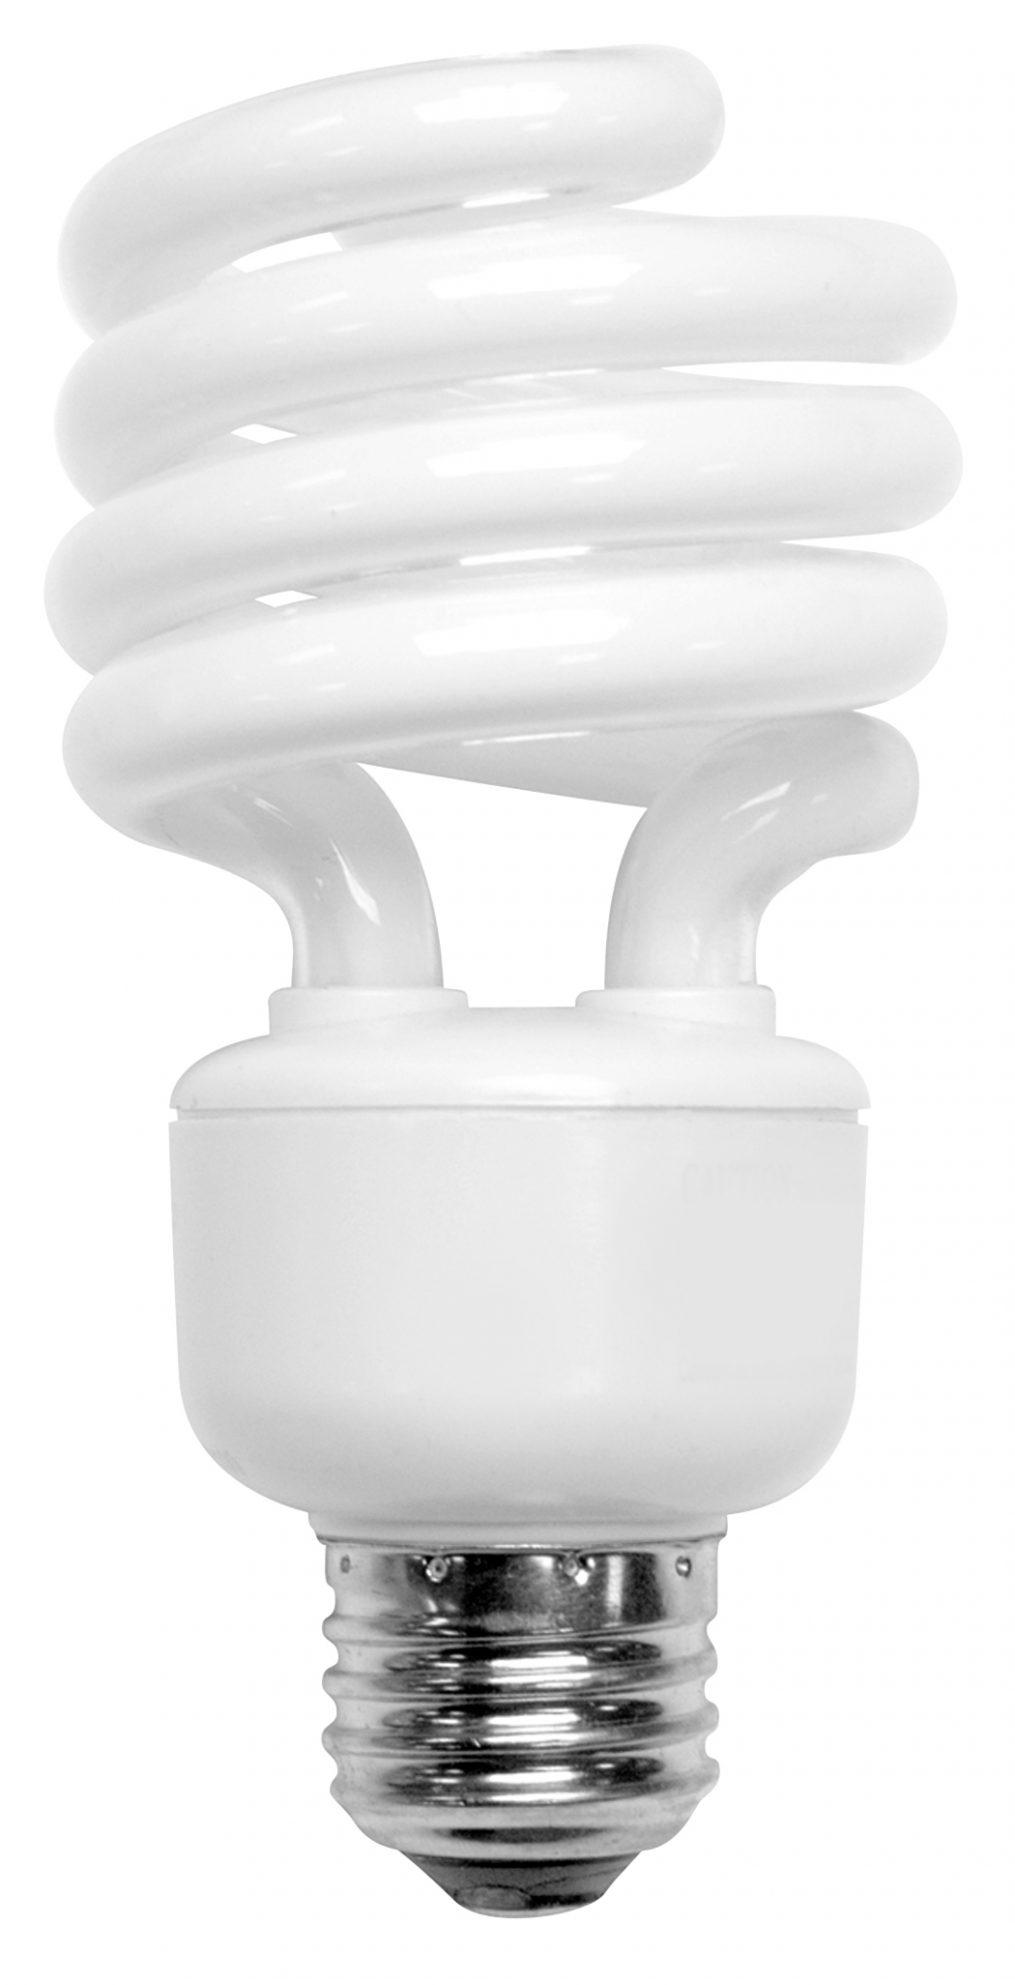 Fluorescent Lights: Compact Light Bulb. ... Mattresses Dining Tables ...